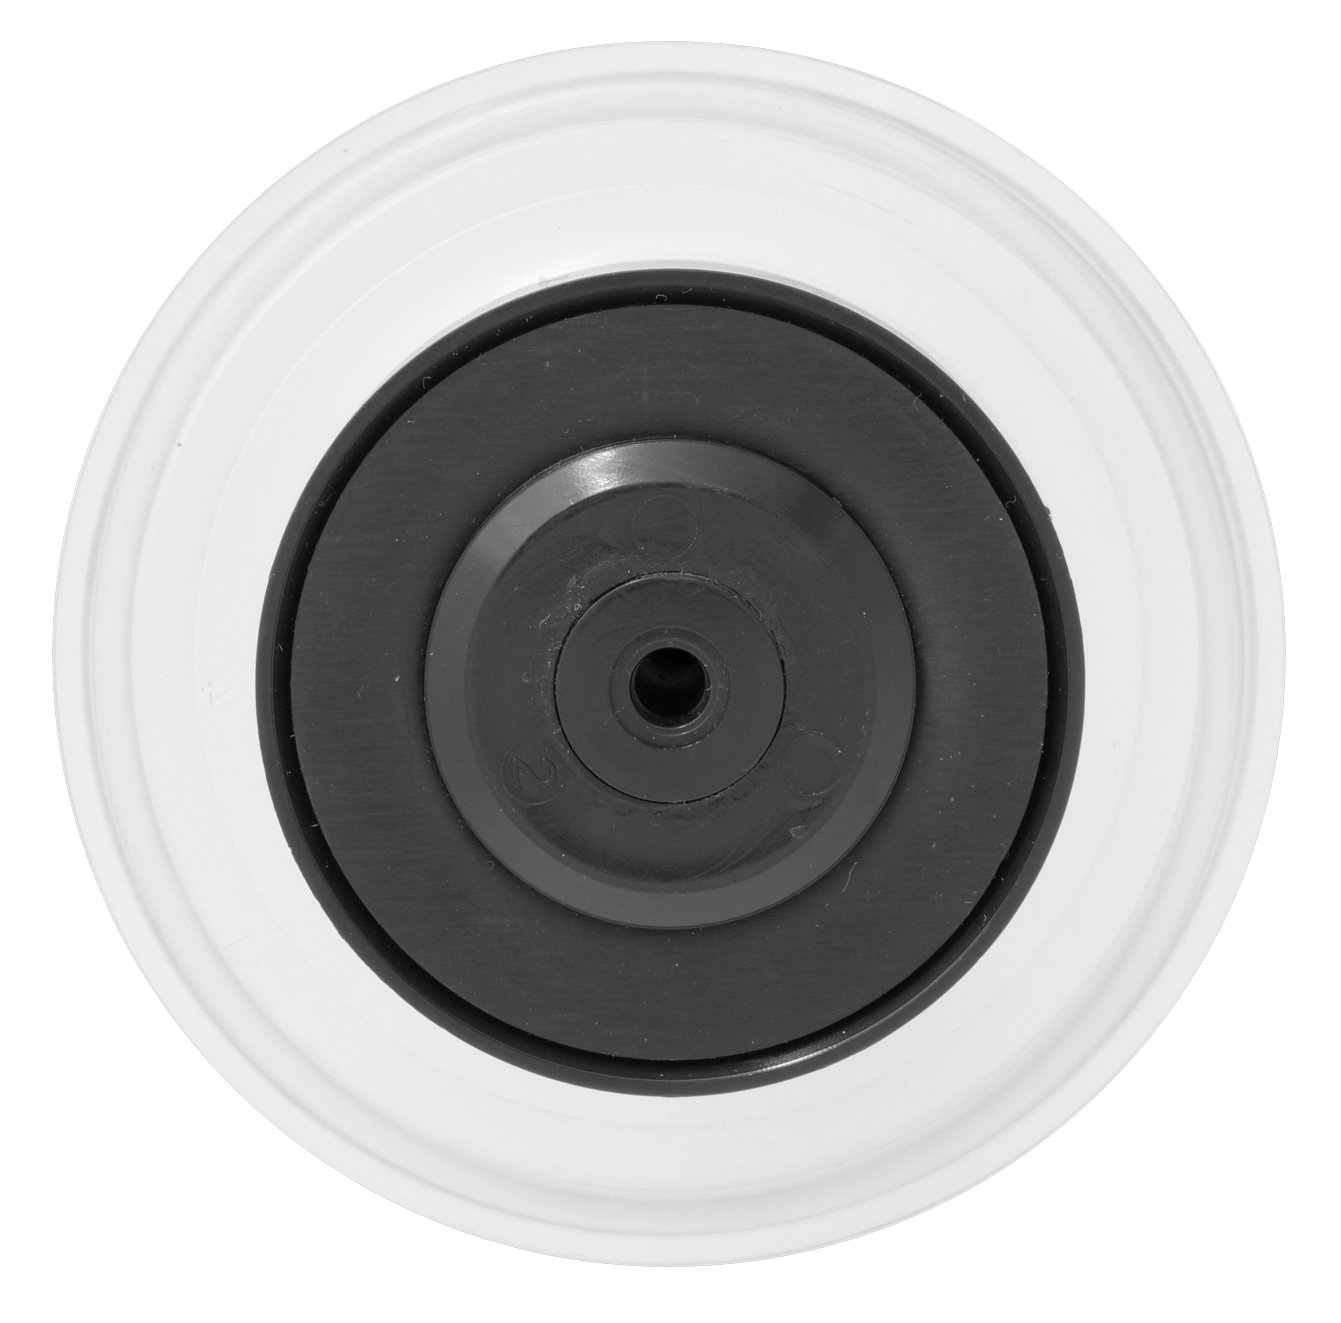 Orbit 5 Pack Replacement Diaphragm for Jar-Top Sprinkler Valves